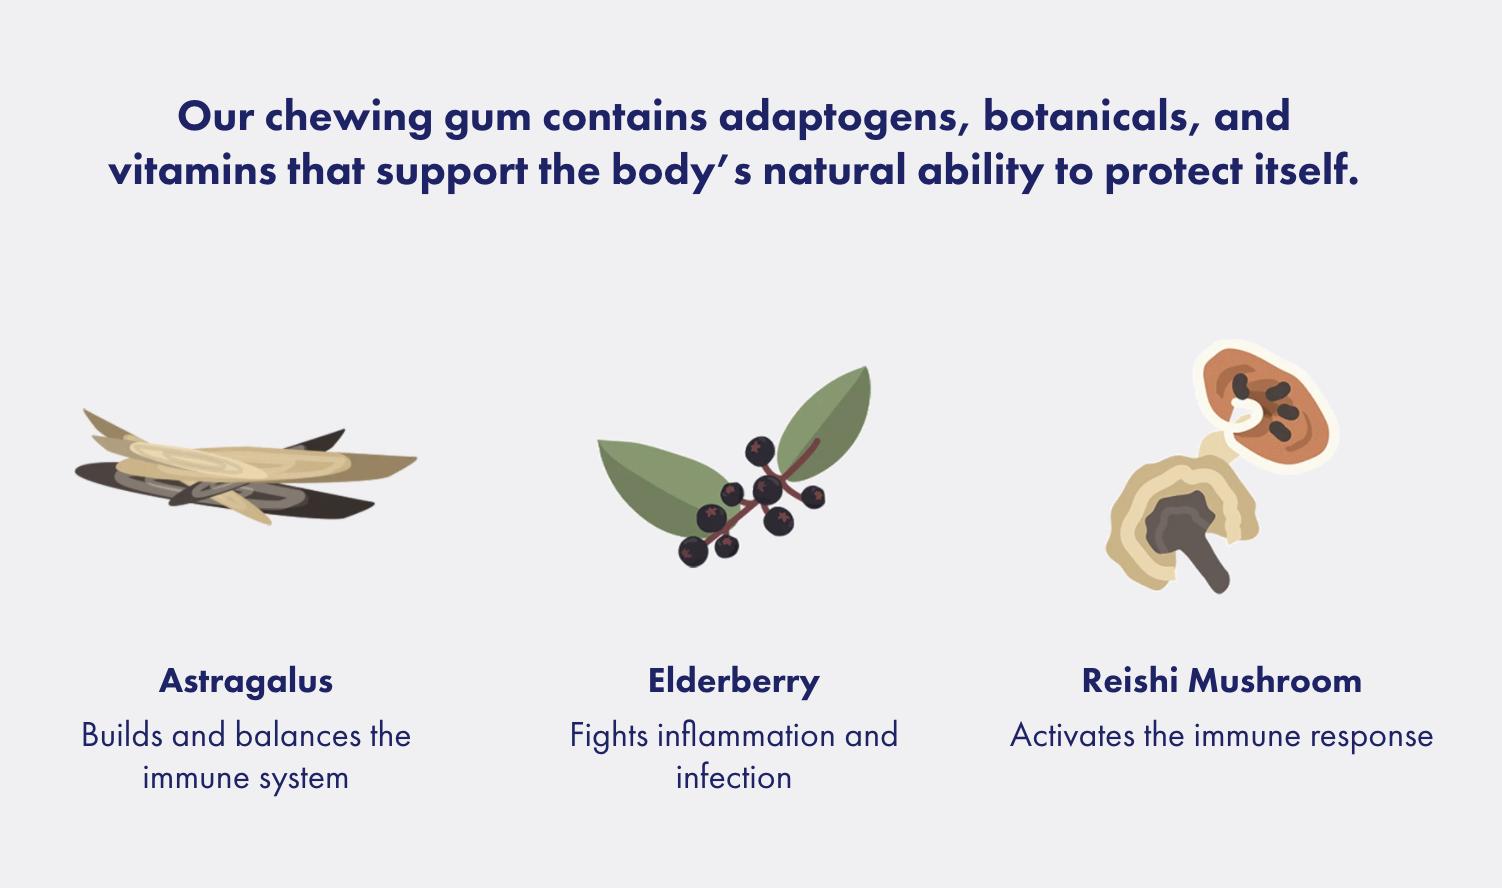 Immune System Boosting Chewing Gum